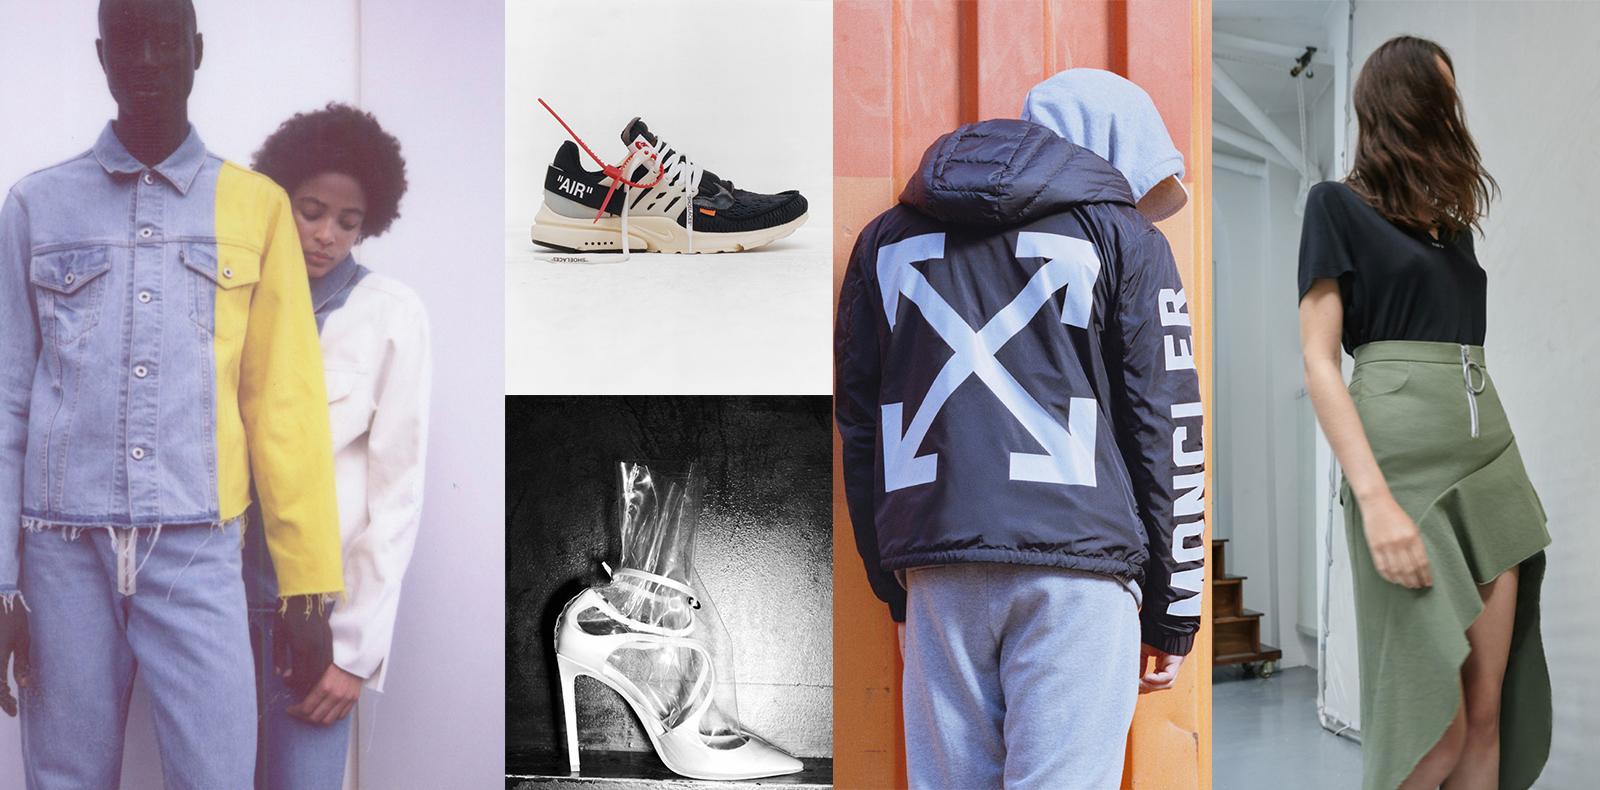 Off-White x Levi's, Virgil Abloh x Nike, Off-White x Jimmy Choo, Off-White x Moncler, Off-White x MyTheresa